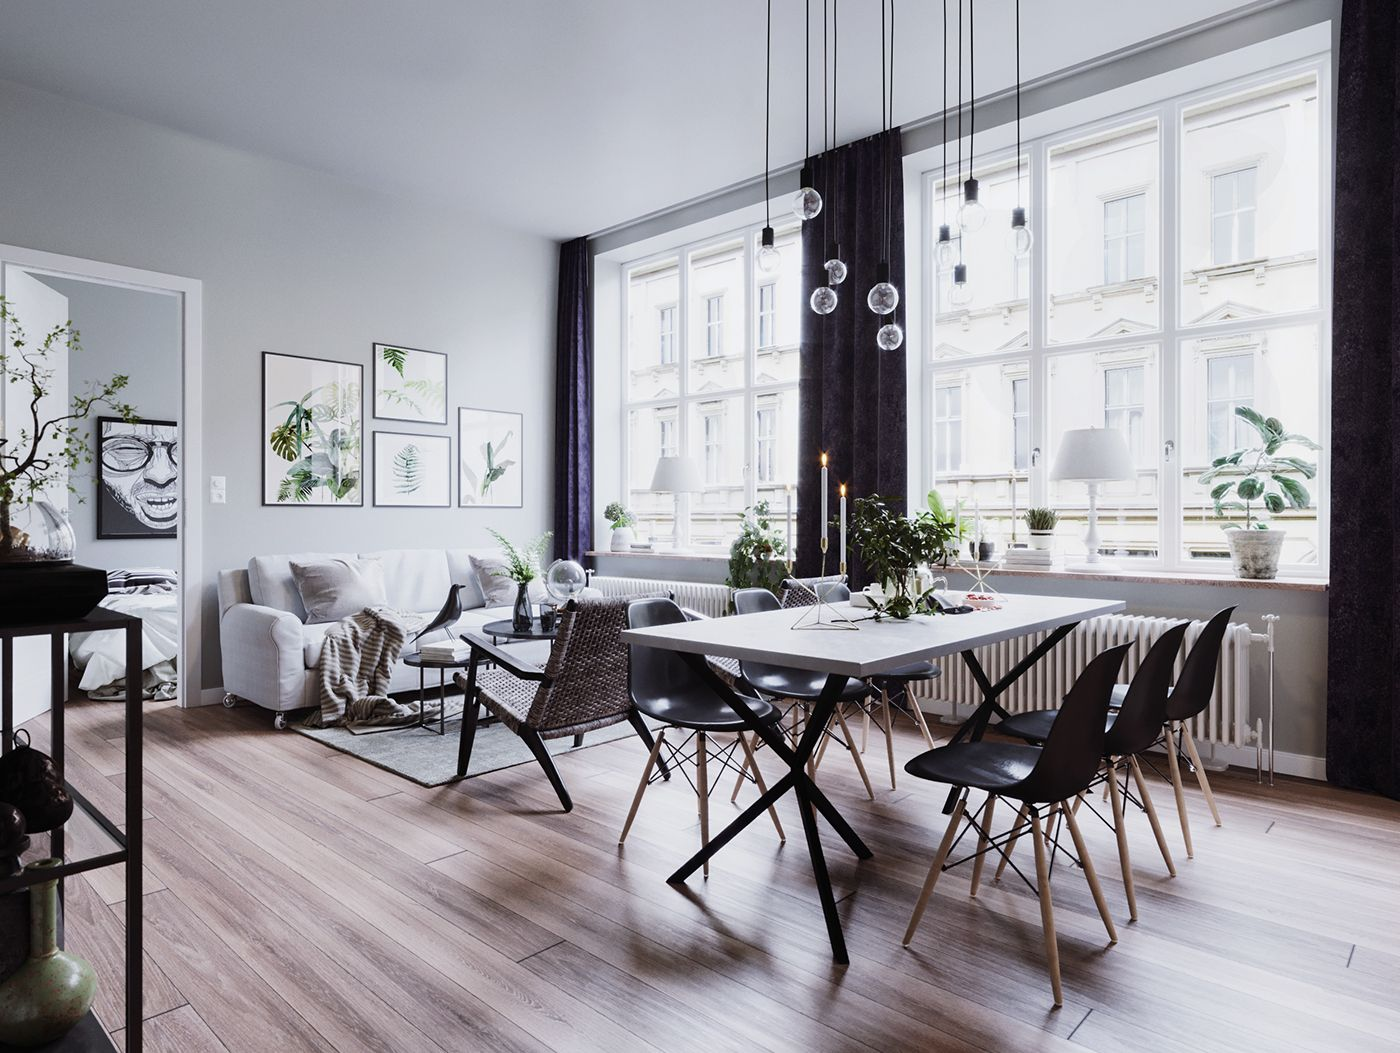 Scandinavian Style Sketchup Corona Render On Behance Scandinavian Style Home House Interior Decor Home